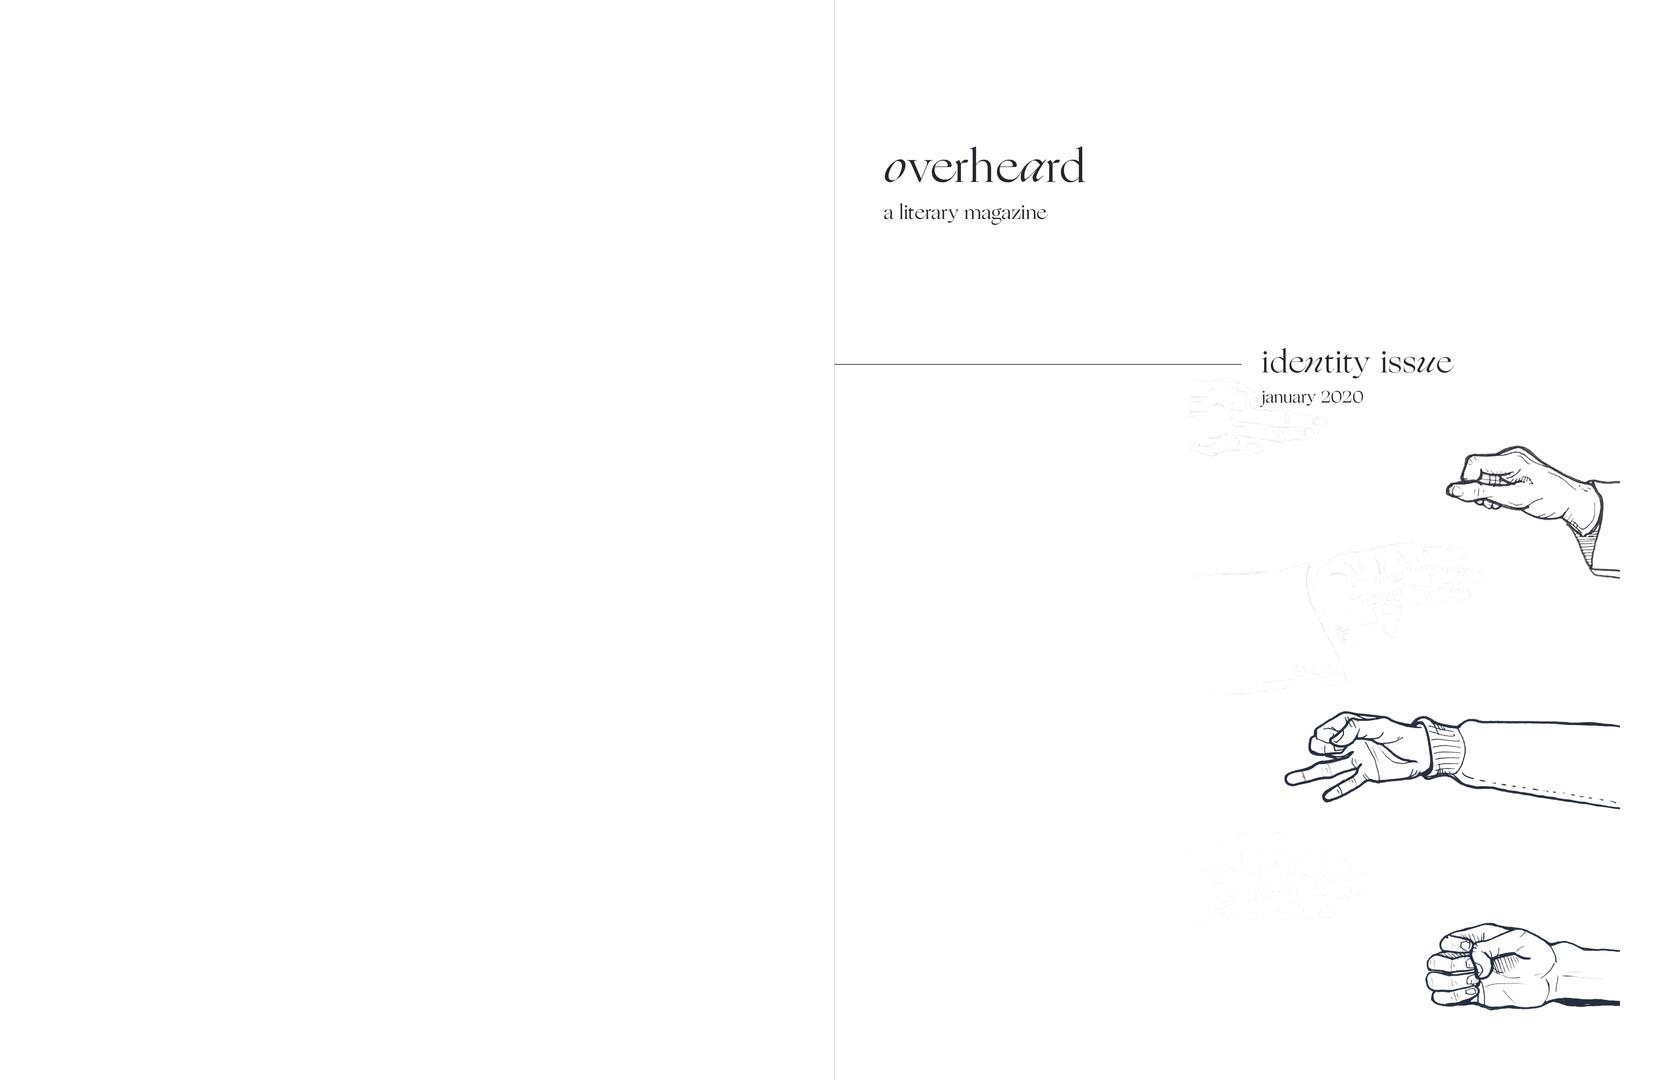 Overheard magazine page 1